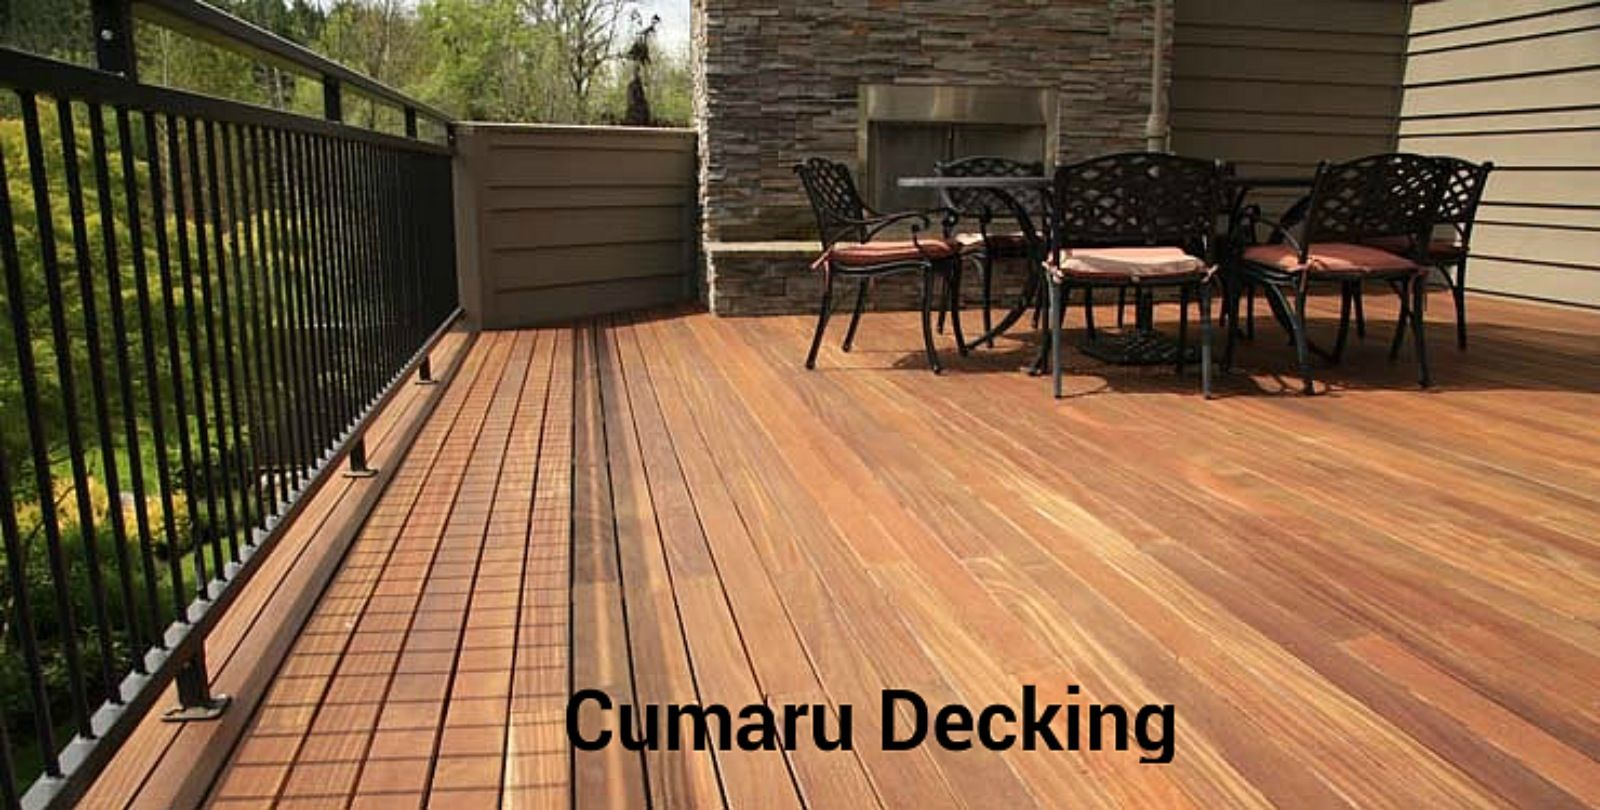 Cumaru Decking Brazilian Teak Decking Cumaru Decking Ipe Decking Deck